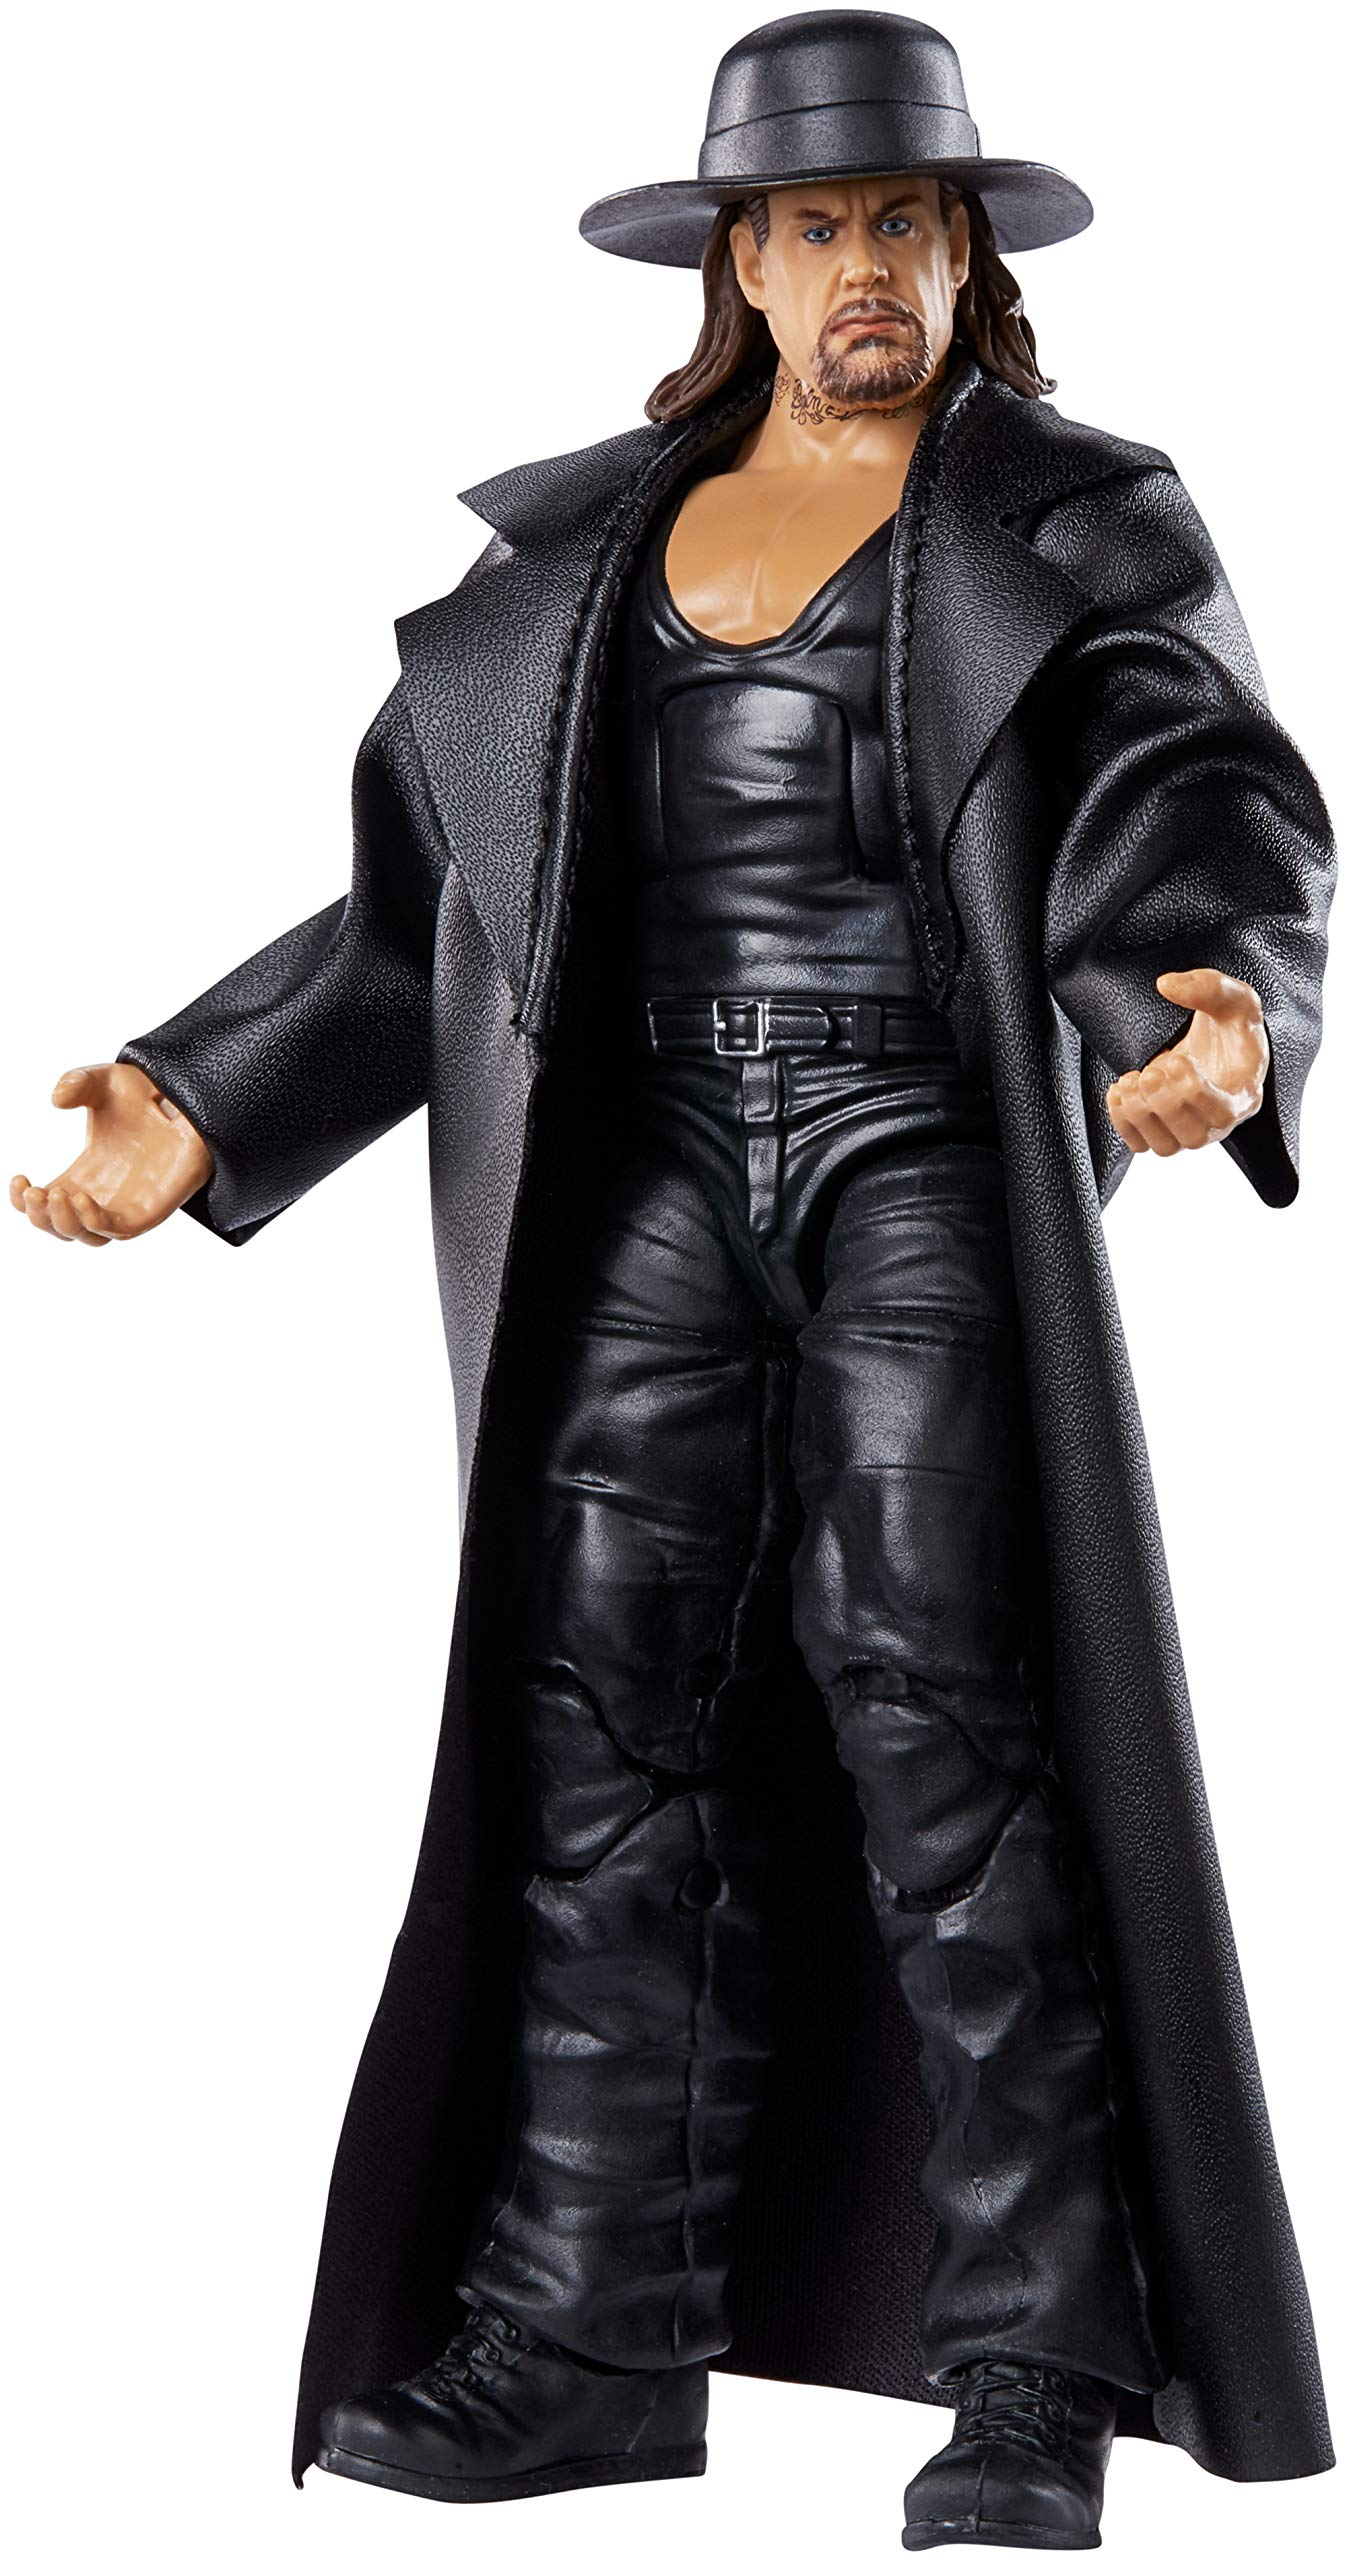 WWE Wrestlemania Undertaker Elite Collection Action Figure